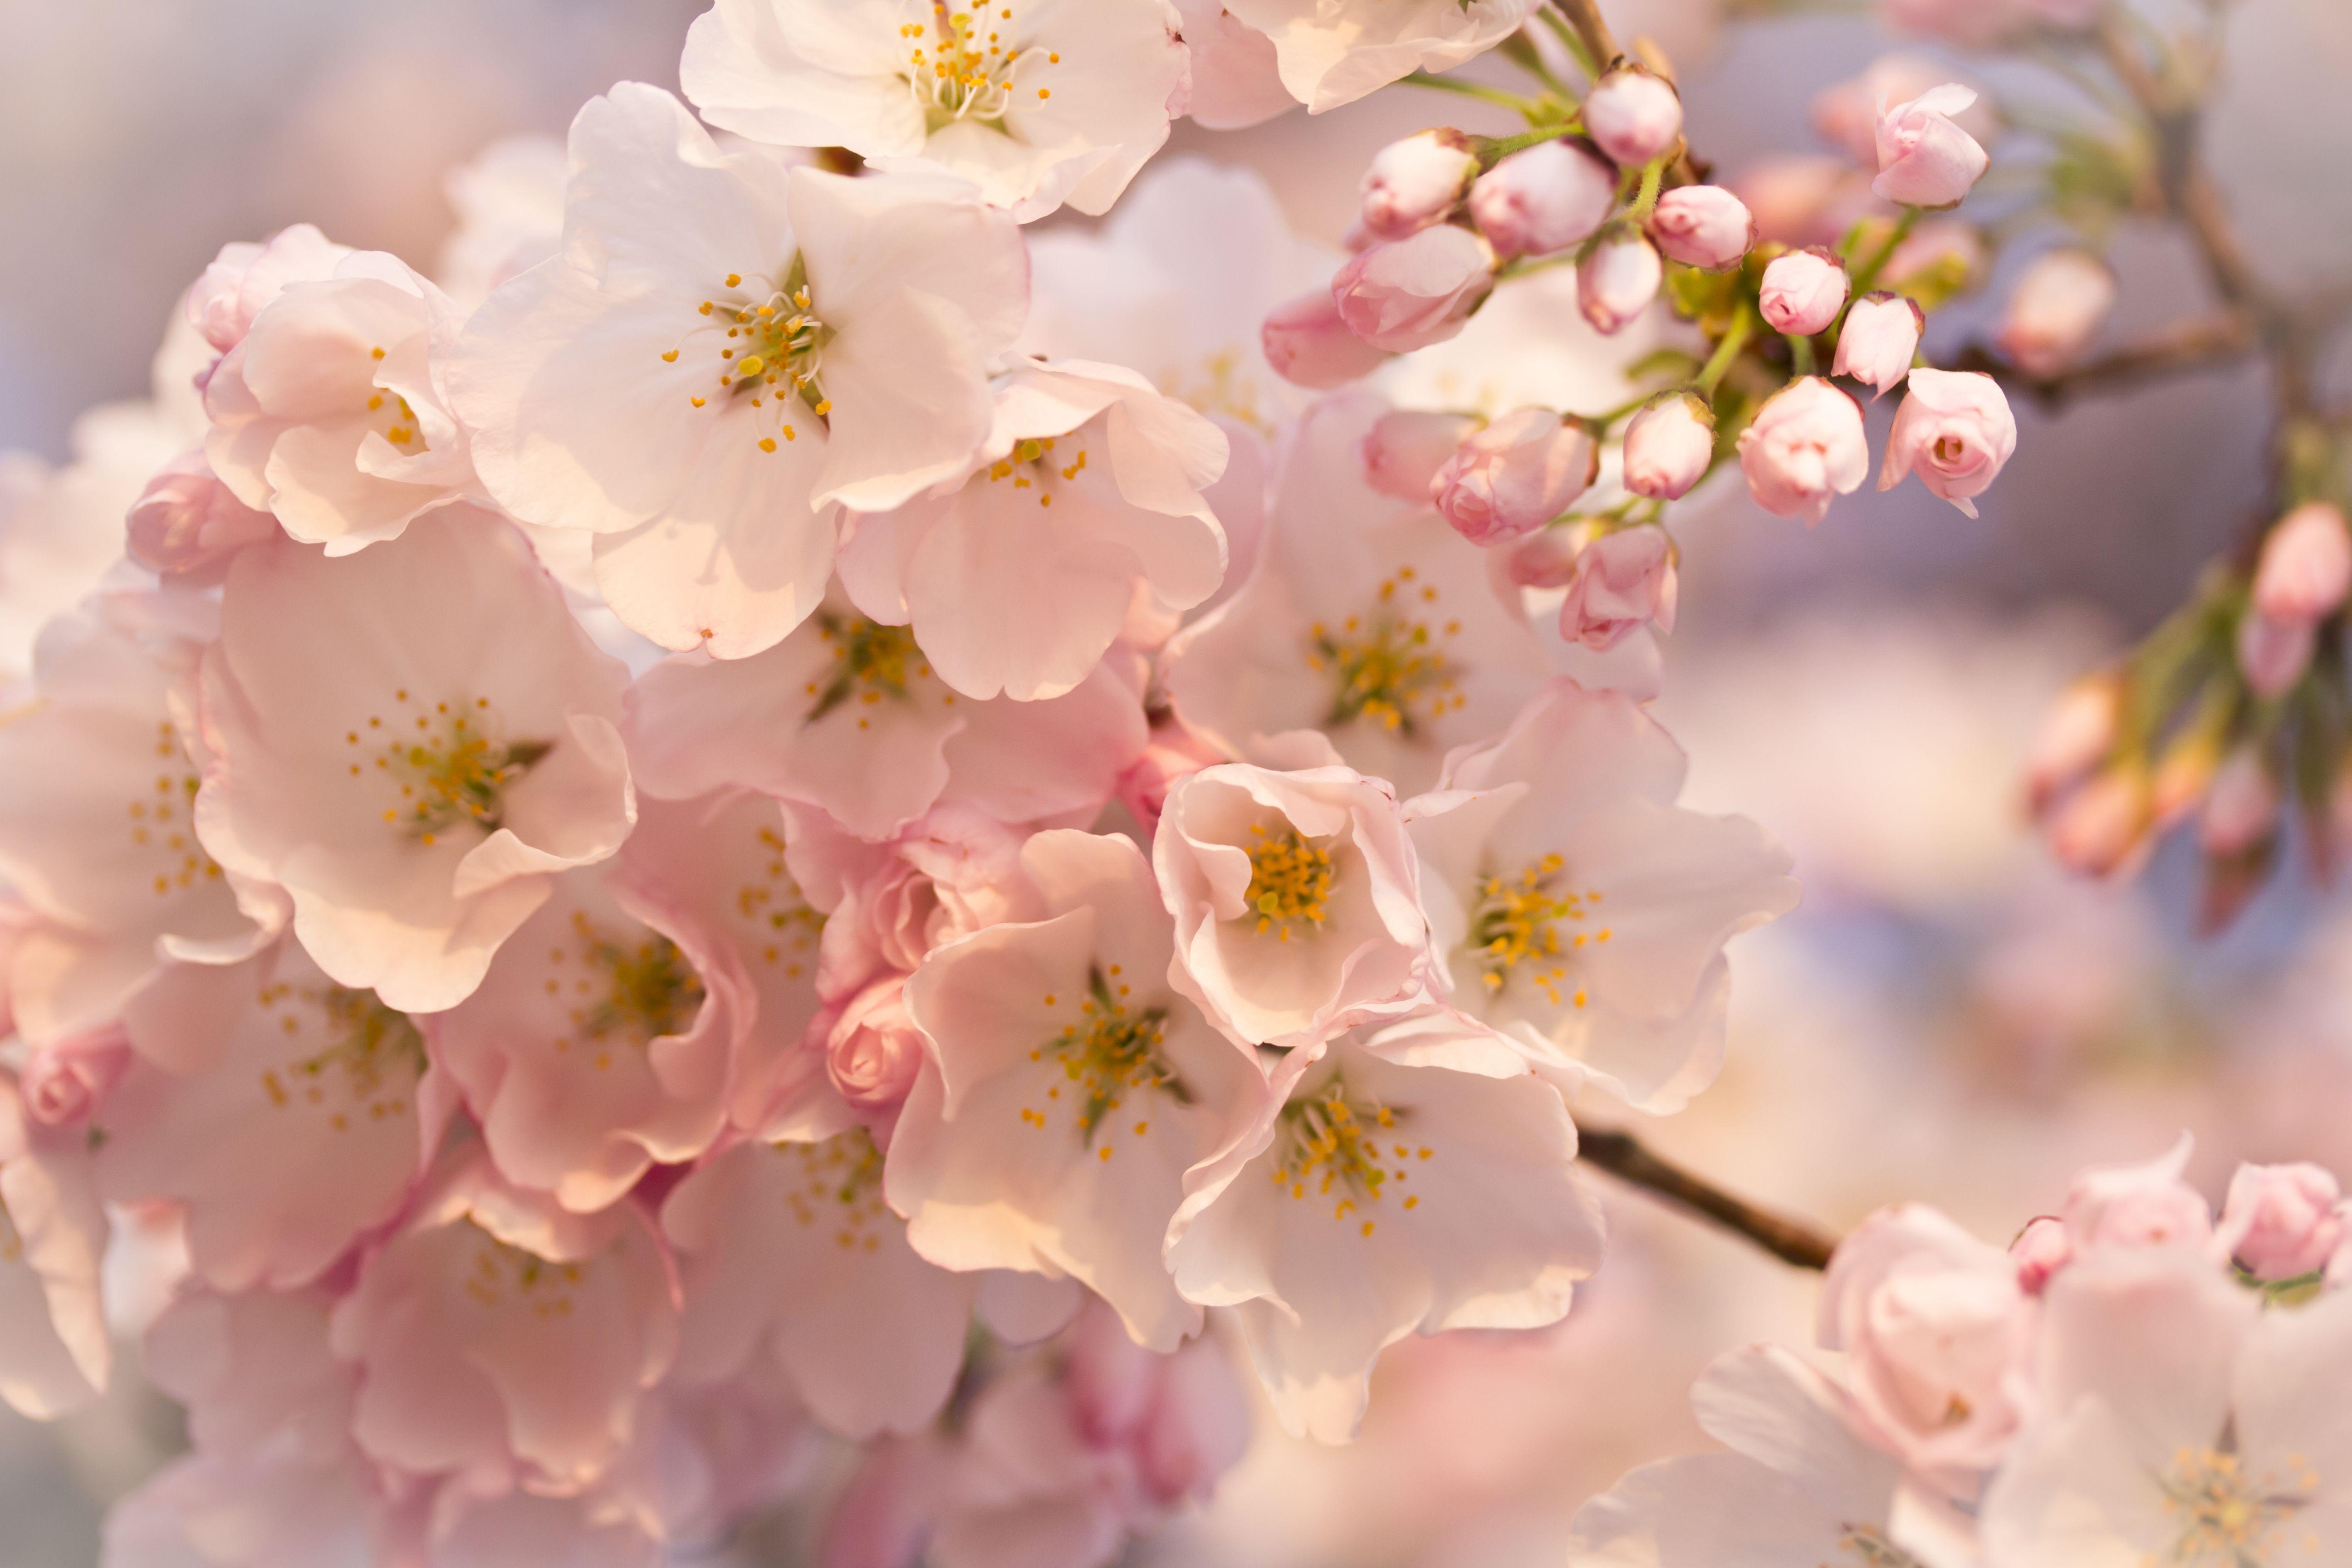 spring flowers macro hd desktop wallpaper widescreen high